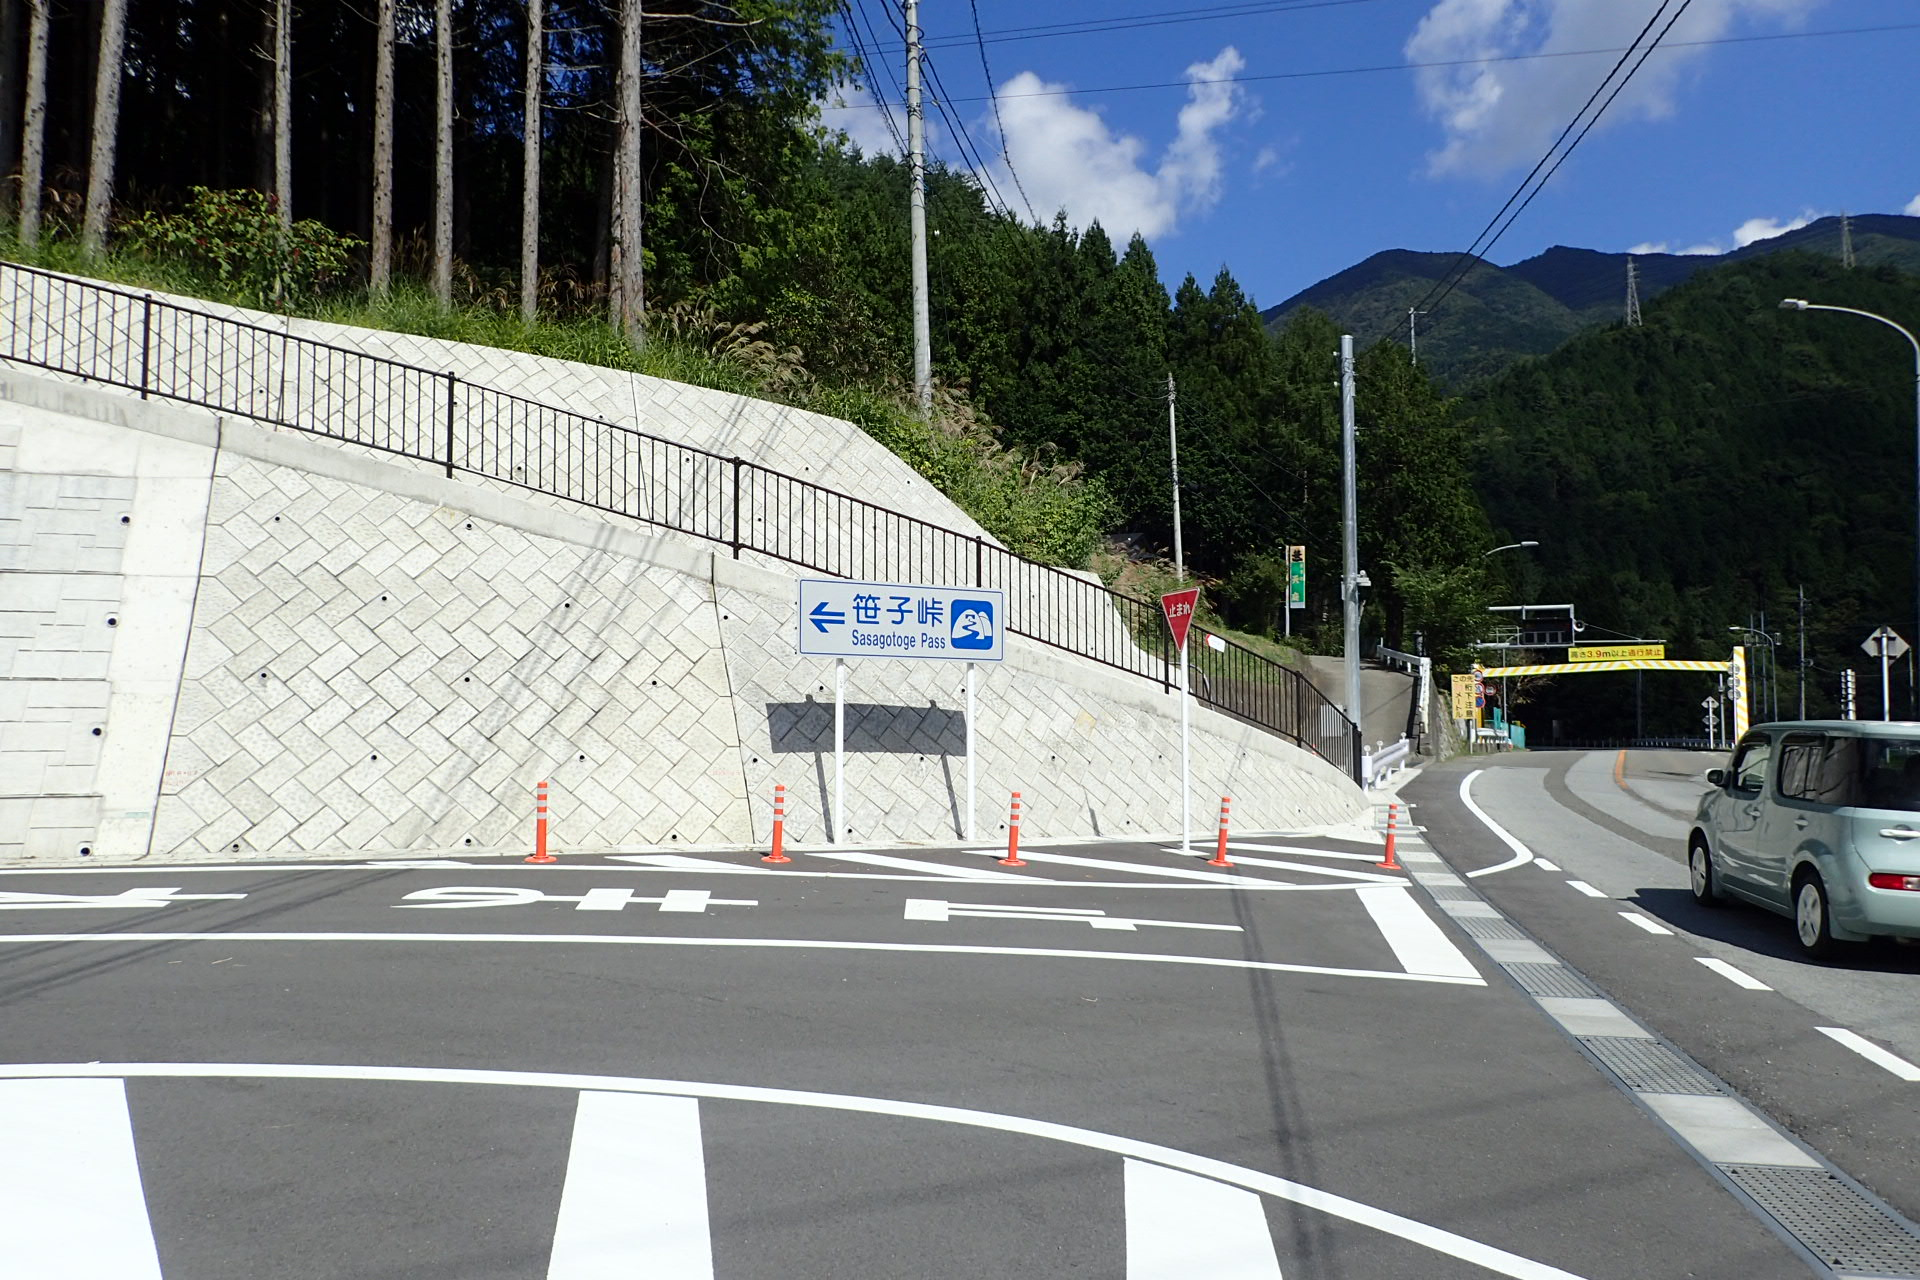 http://www.yamanashi-kankou.jp/blog/s03.JPG